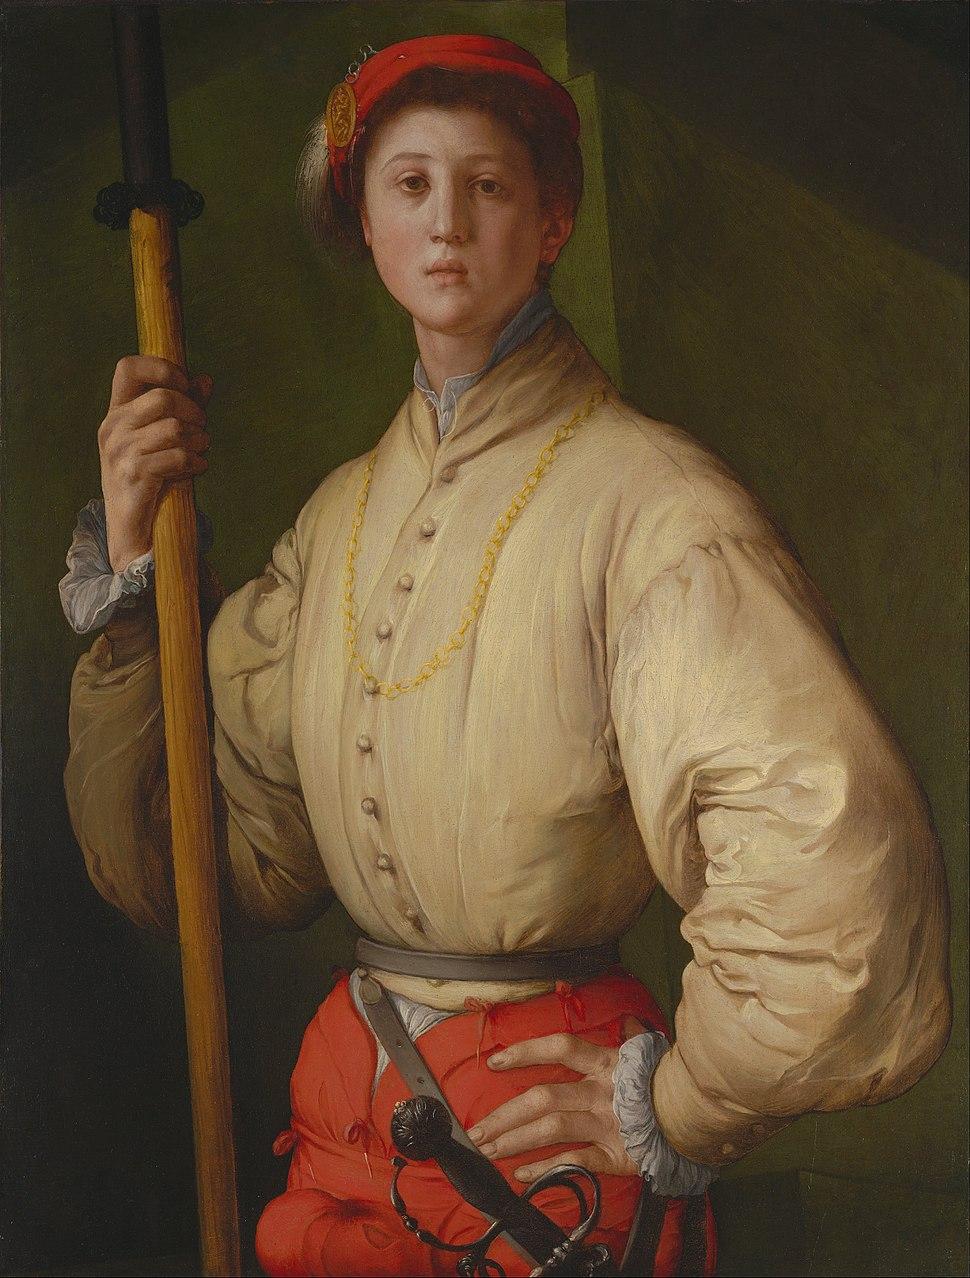 Pontormo (Jacopo Carucci) (Italian, Florentine) - Portrait of a Halberdier (Francesco Guardi?) - Google Art Project